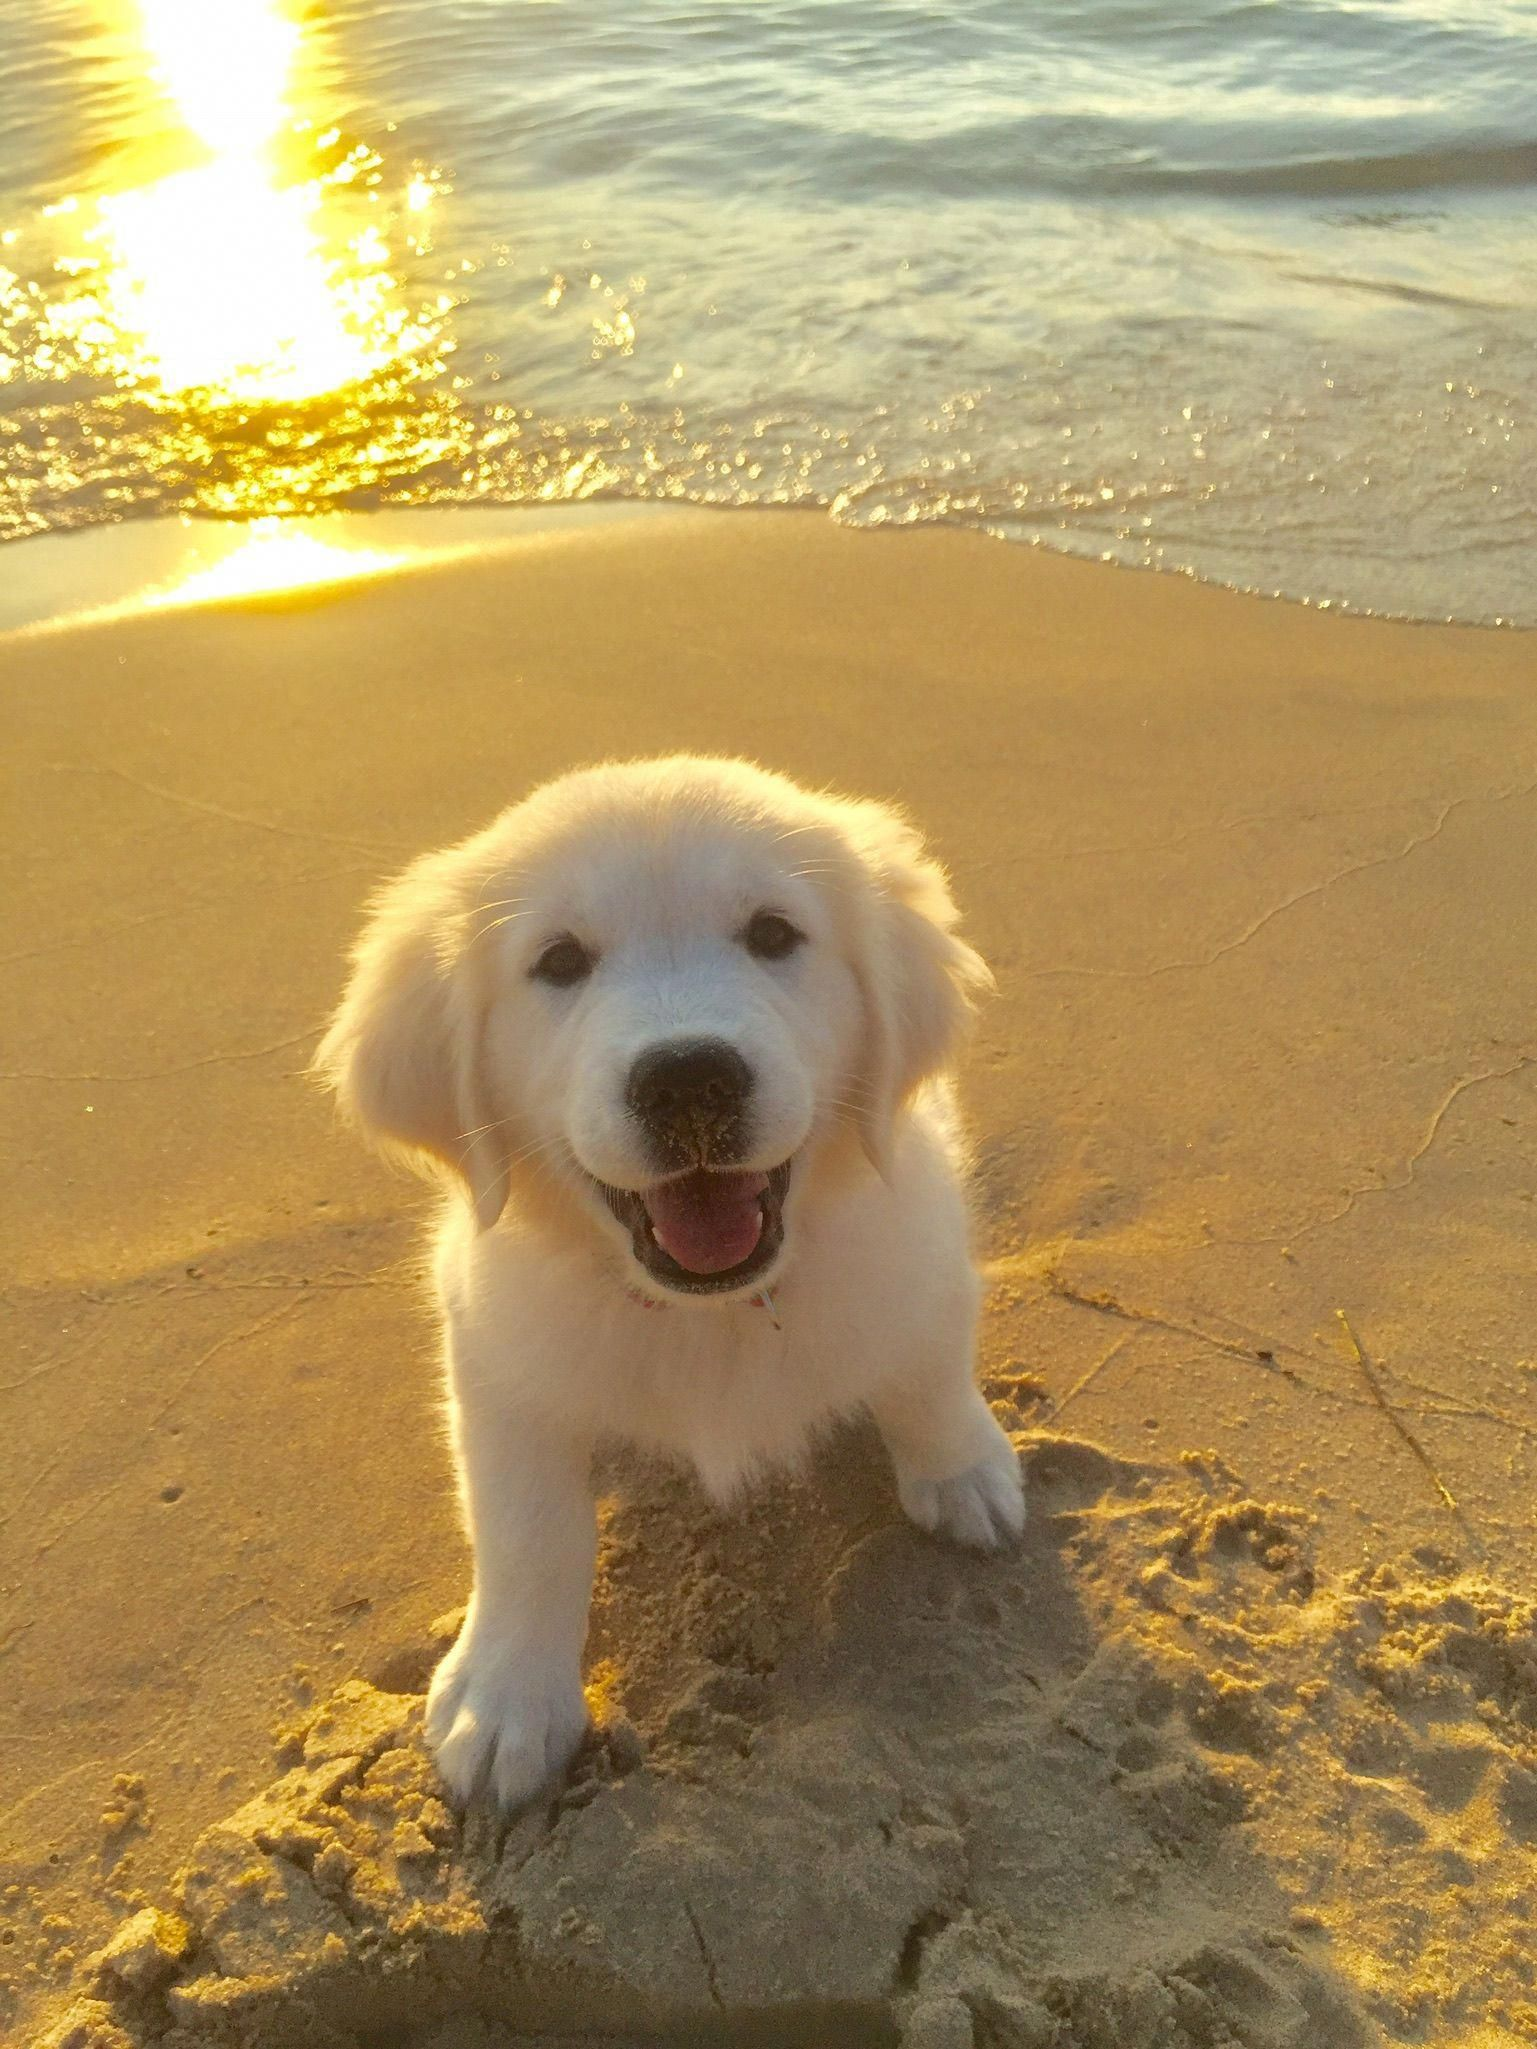 Cute Golden Retriever Puppy On The Beach At Sunset Funnydogs Cute Animals Puppies Cute Baby Animals